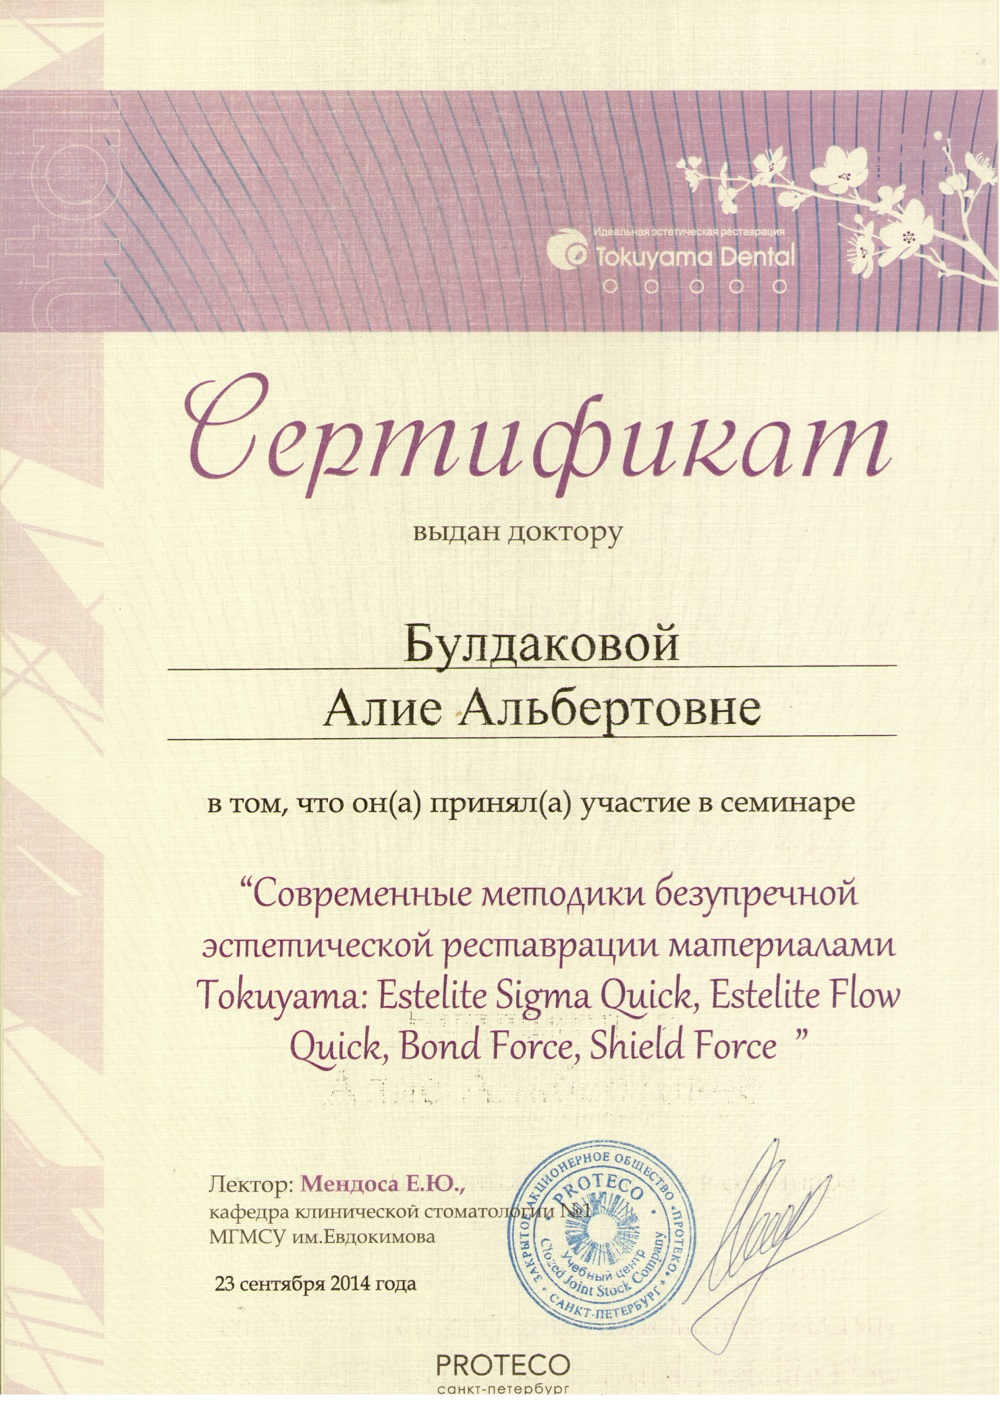 Сертификат Tokuyama dental